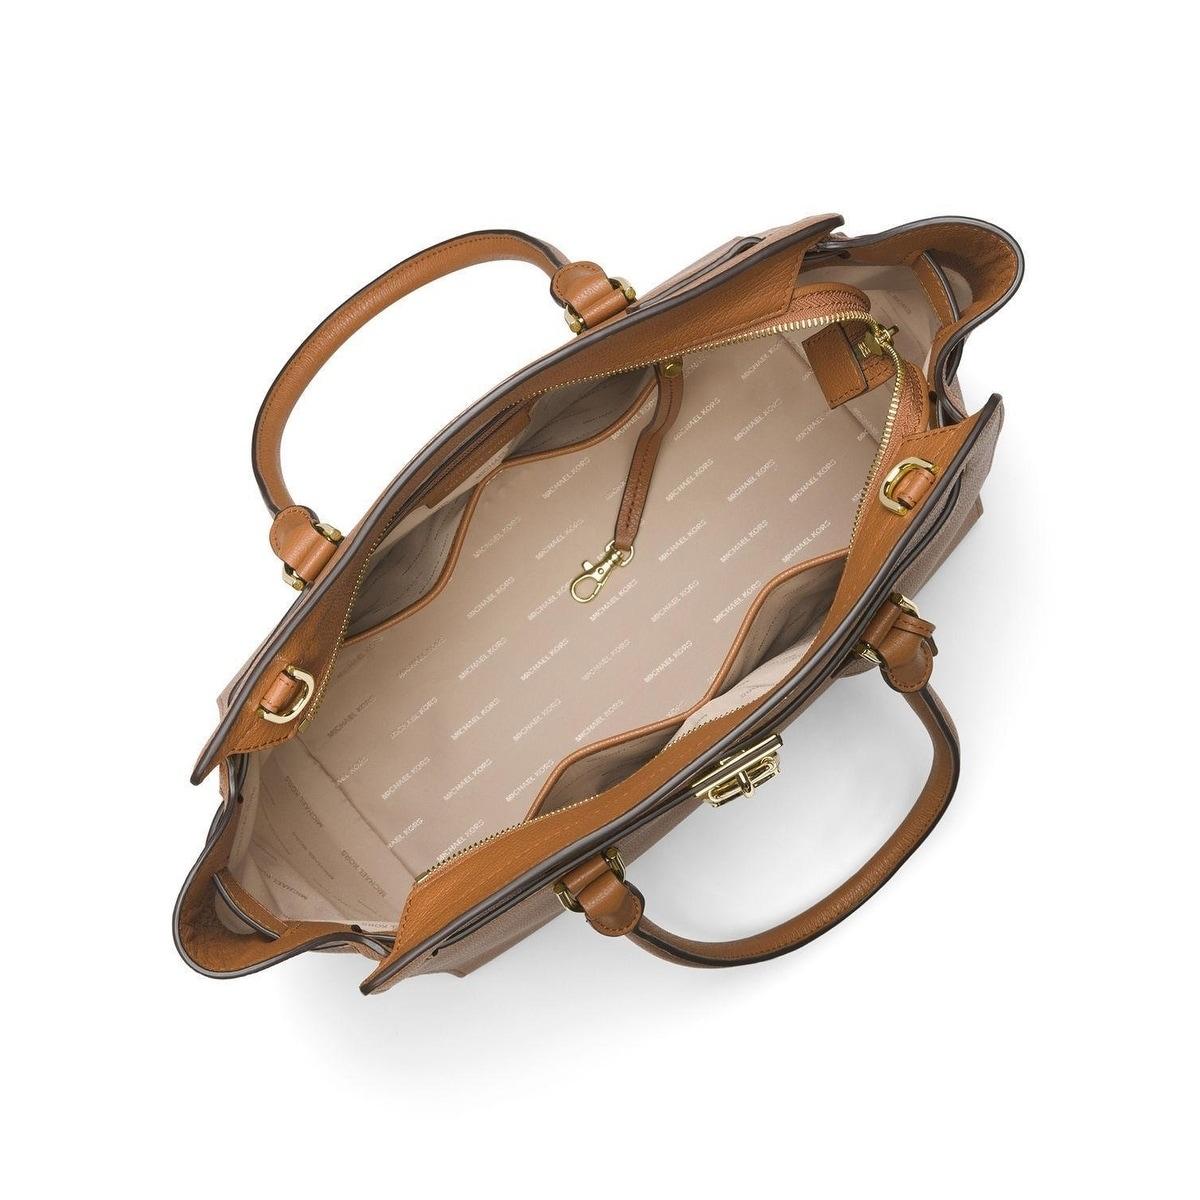 de5189ffb9b6 Shop Michael Kors Hamilton Extra Large Leather Acorn Satchel - XL - Free  Shipping Today - Overstock - 21787865